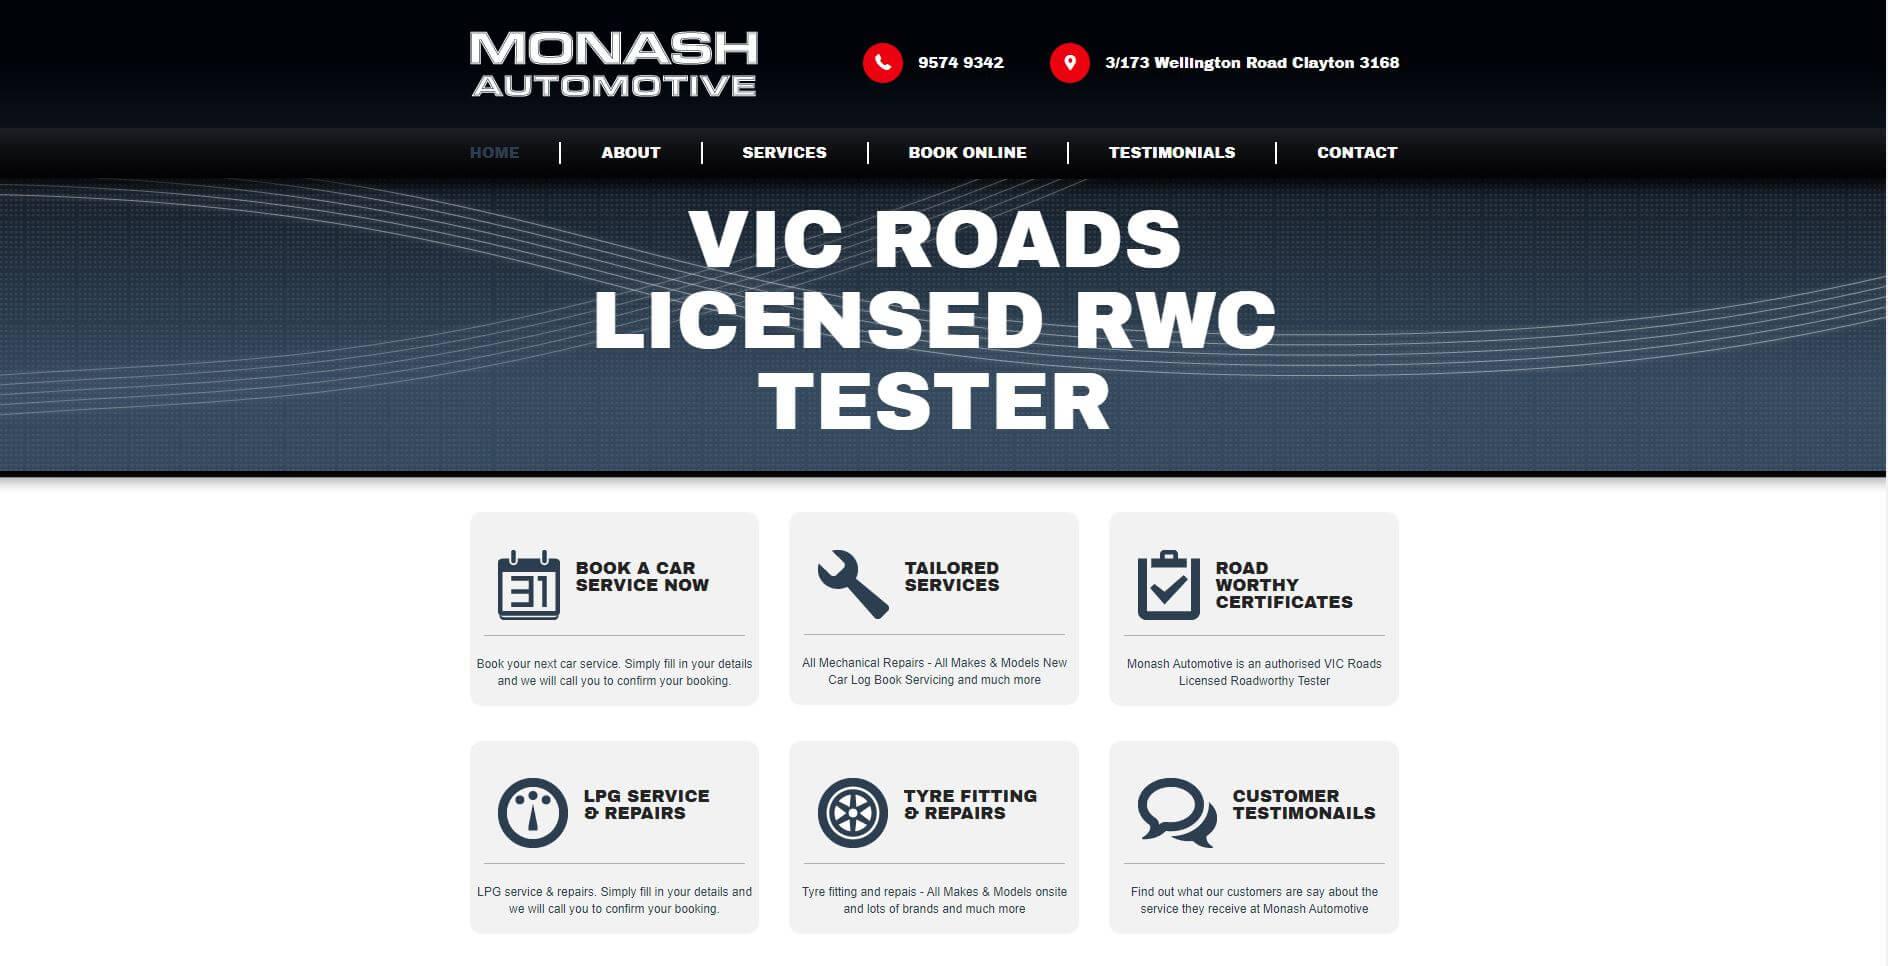 Monash Automotive